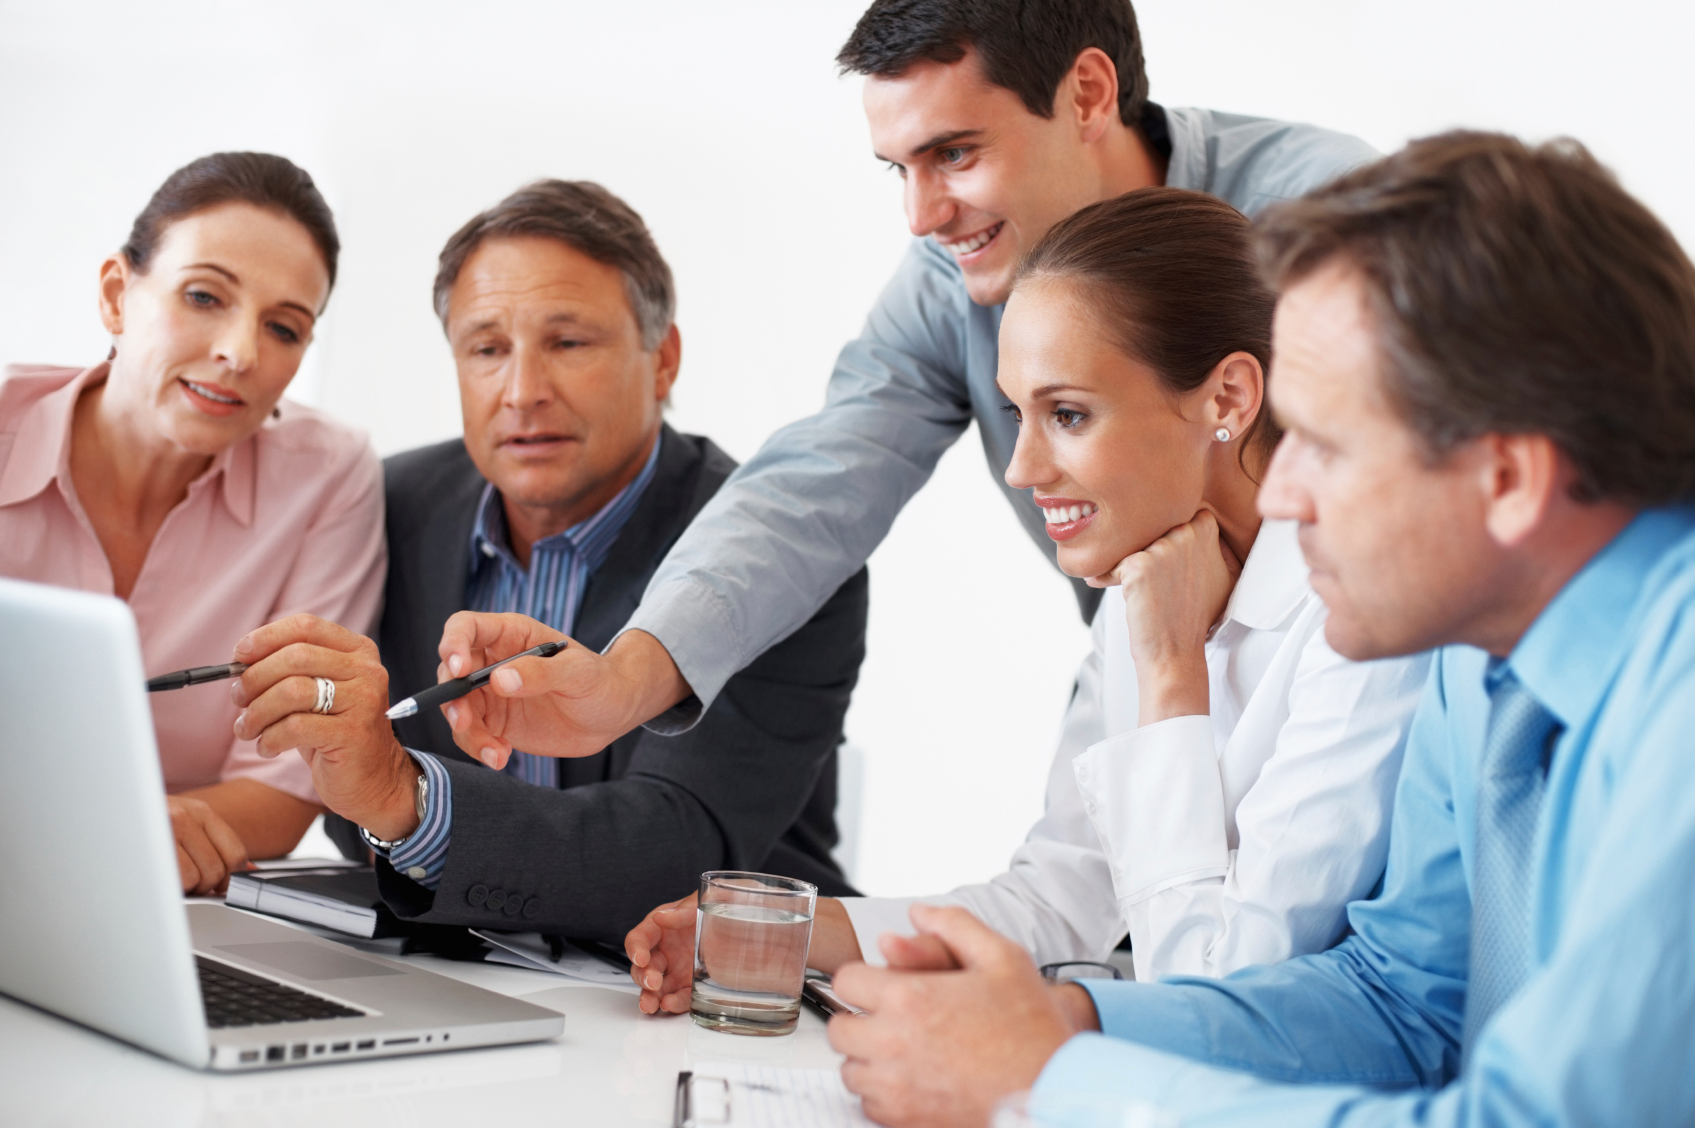 HR Management peo